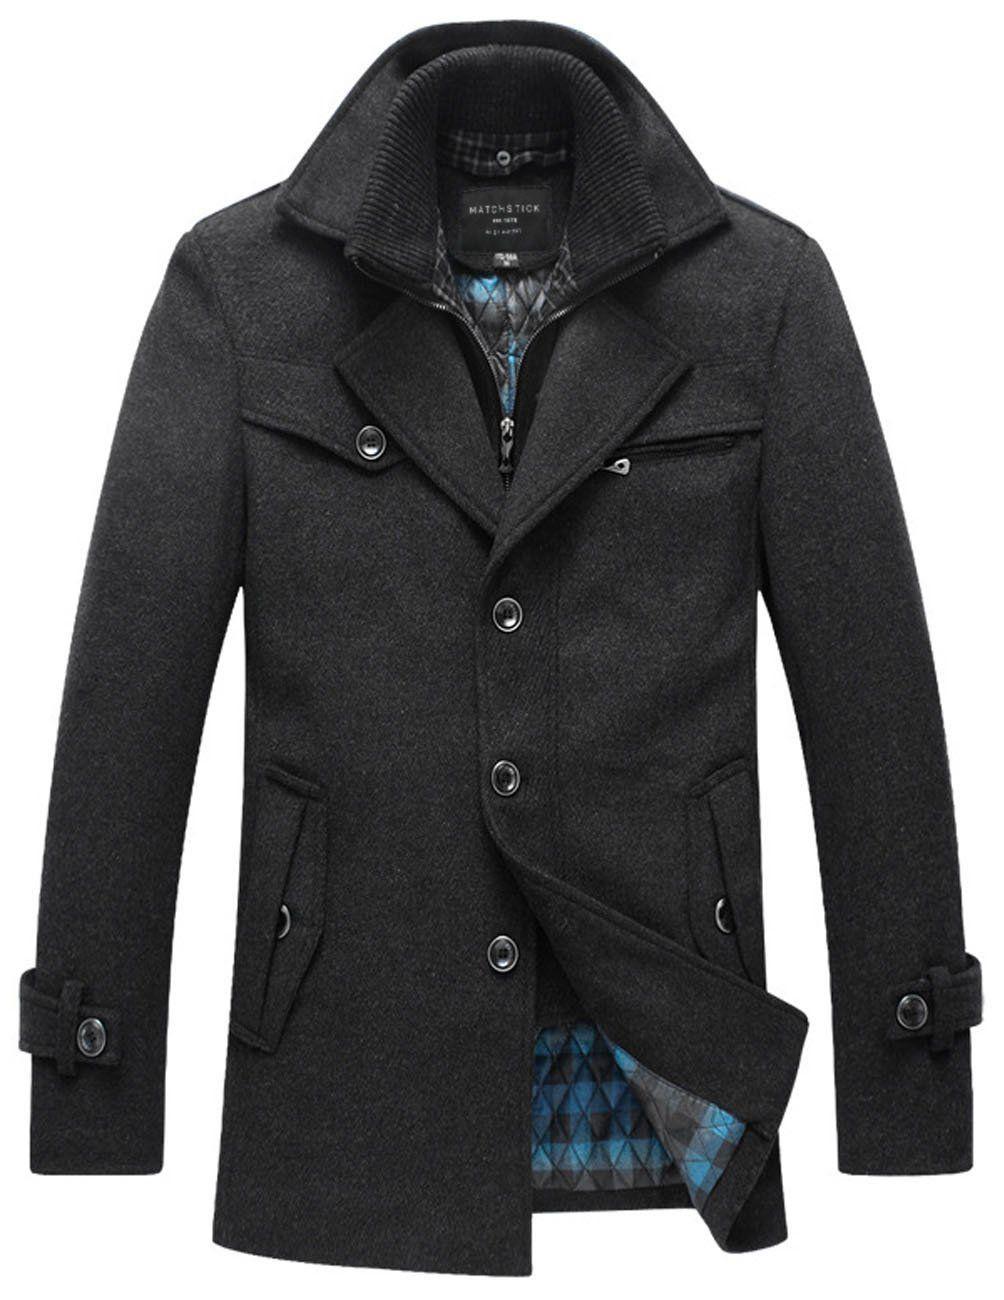 Mens jacket hs code - Match Mens Wool Winter Wool Fleece Coat Trench Coat Label Size Medium Us X